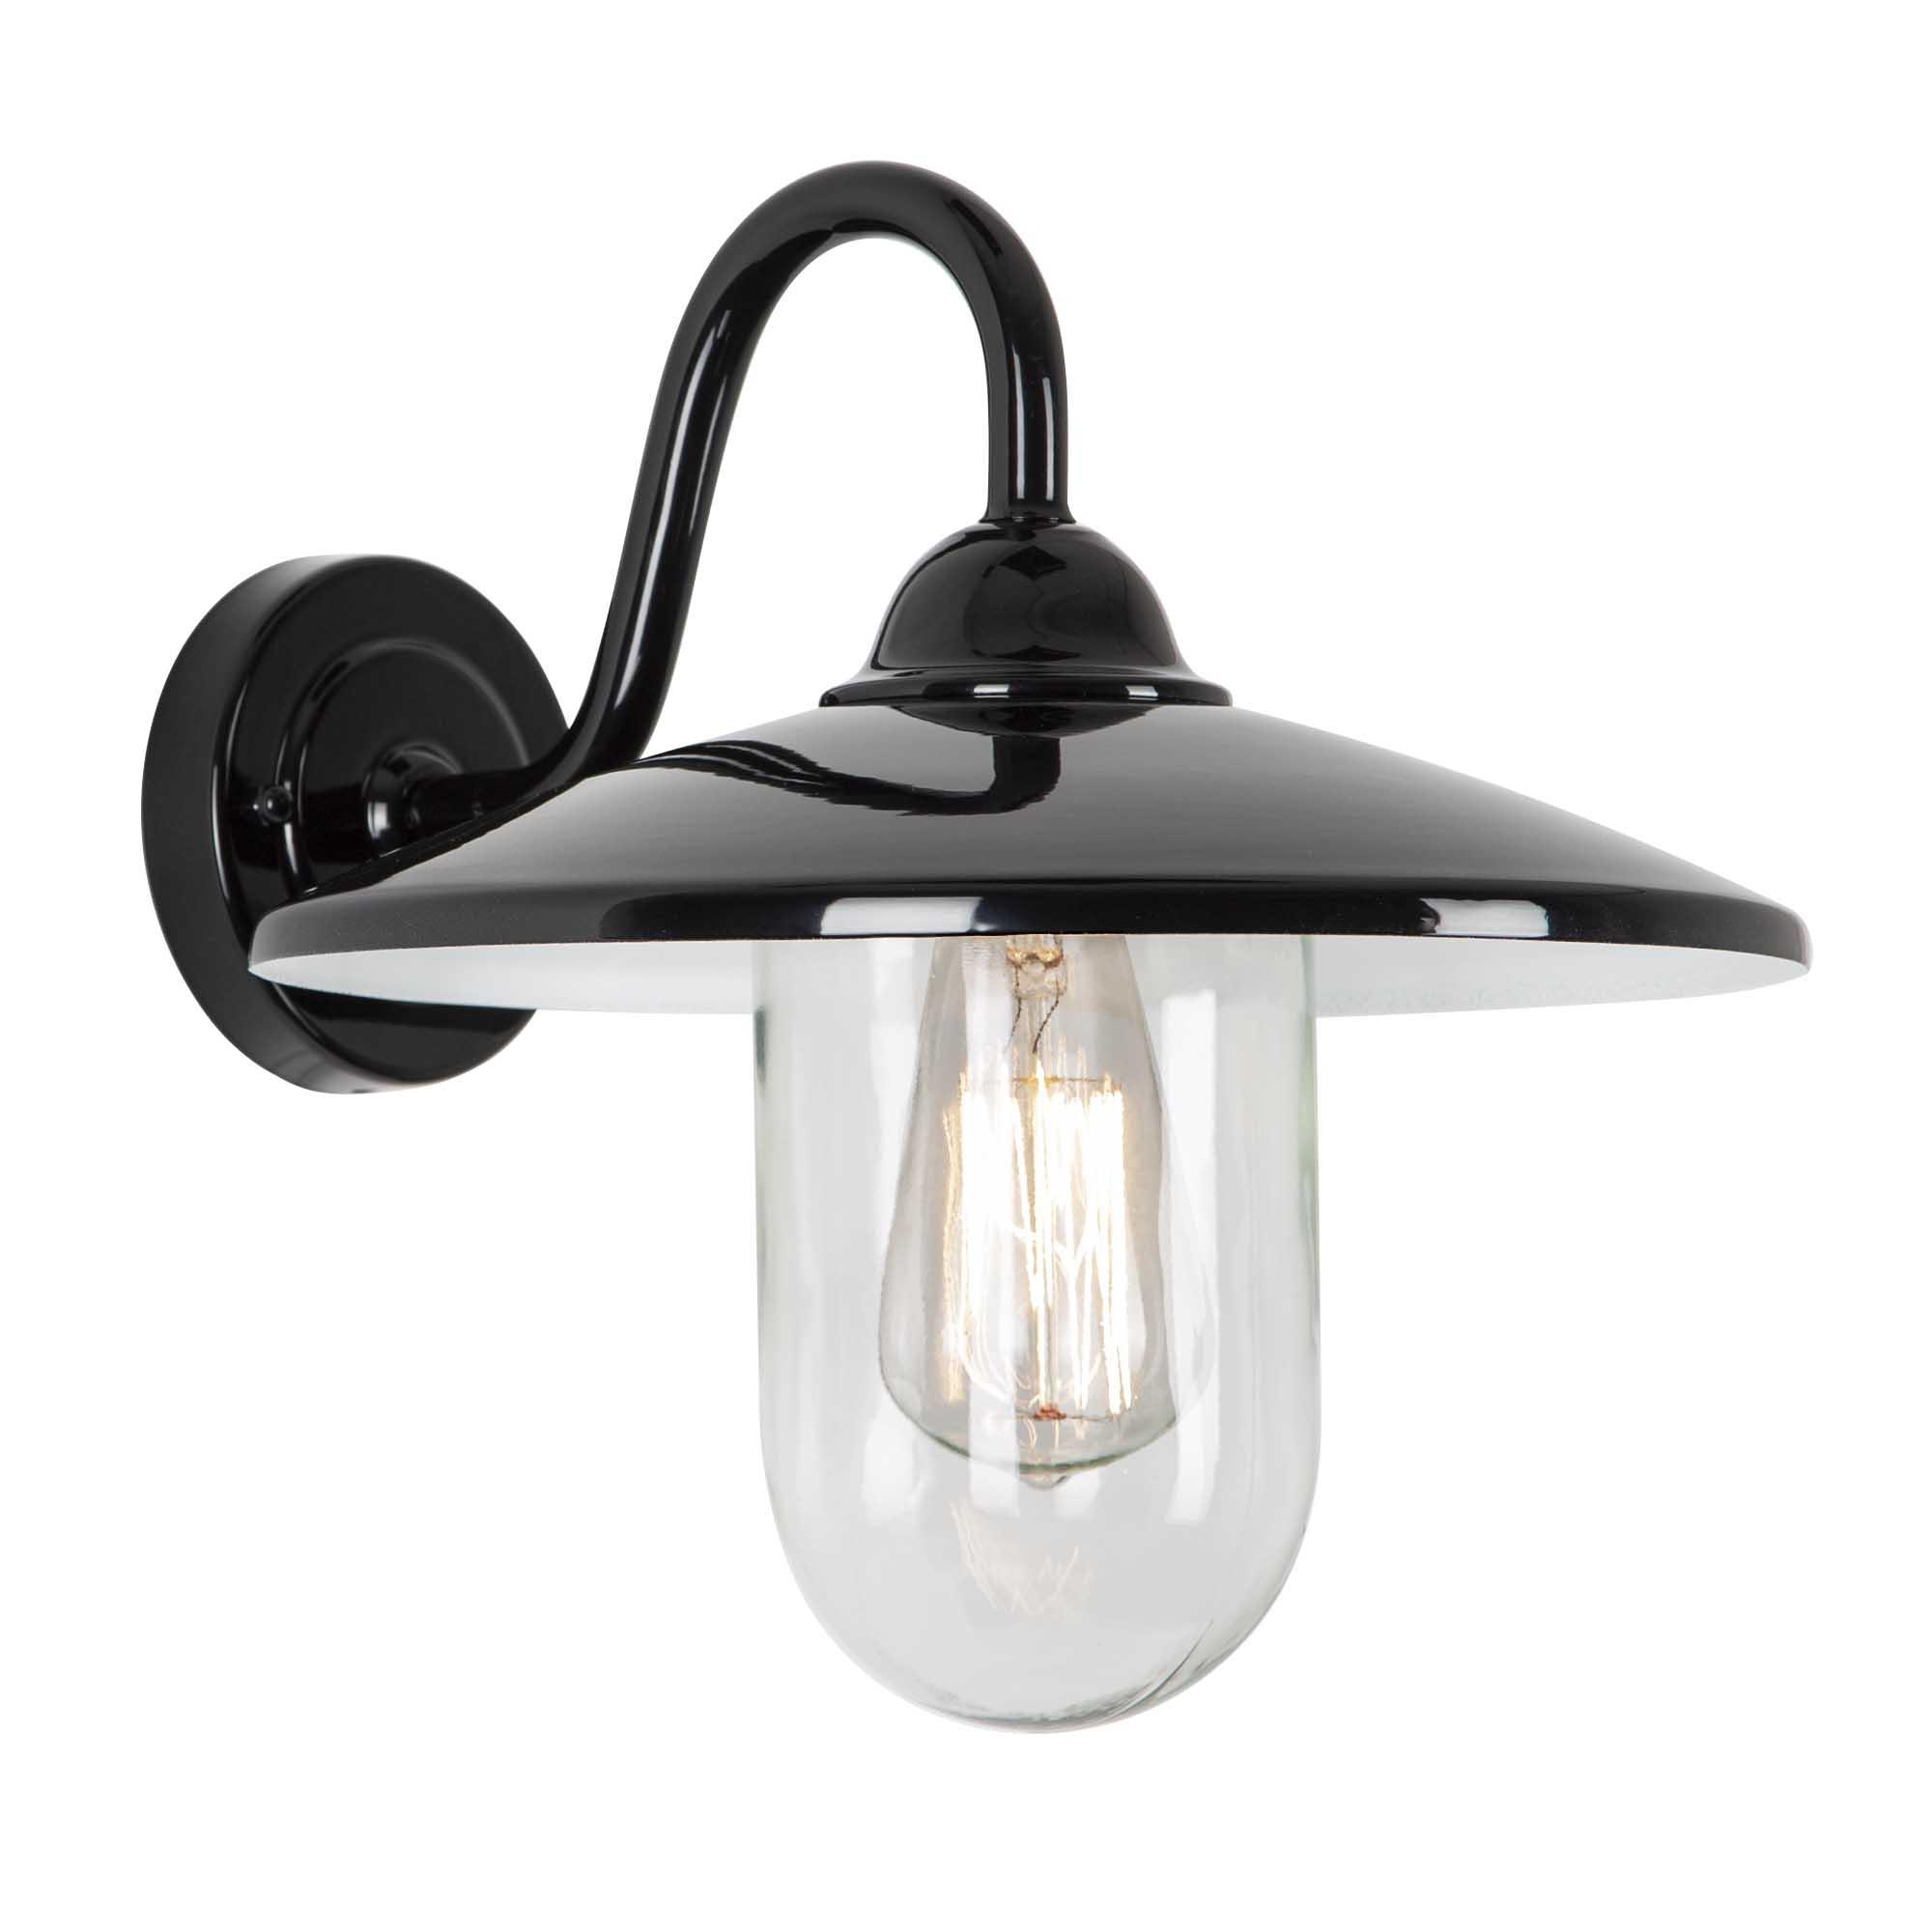 Buitenlamp brig zwart Dag Nacht Schemersensor LED